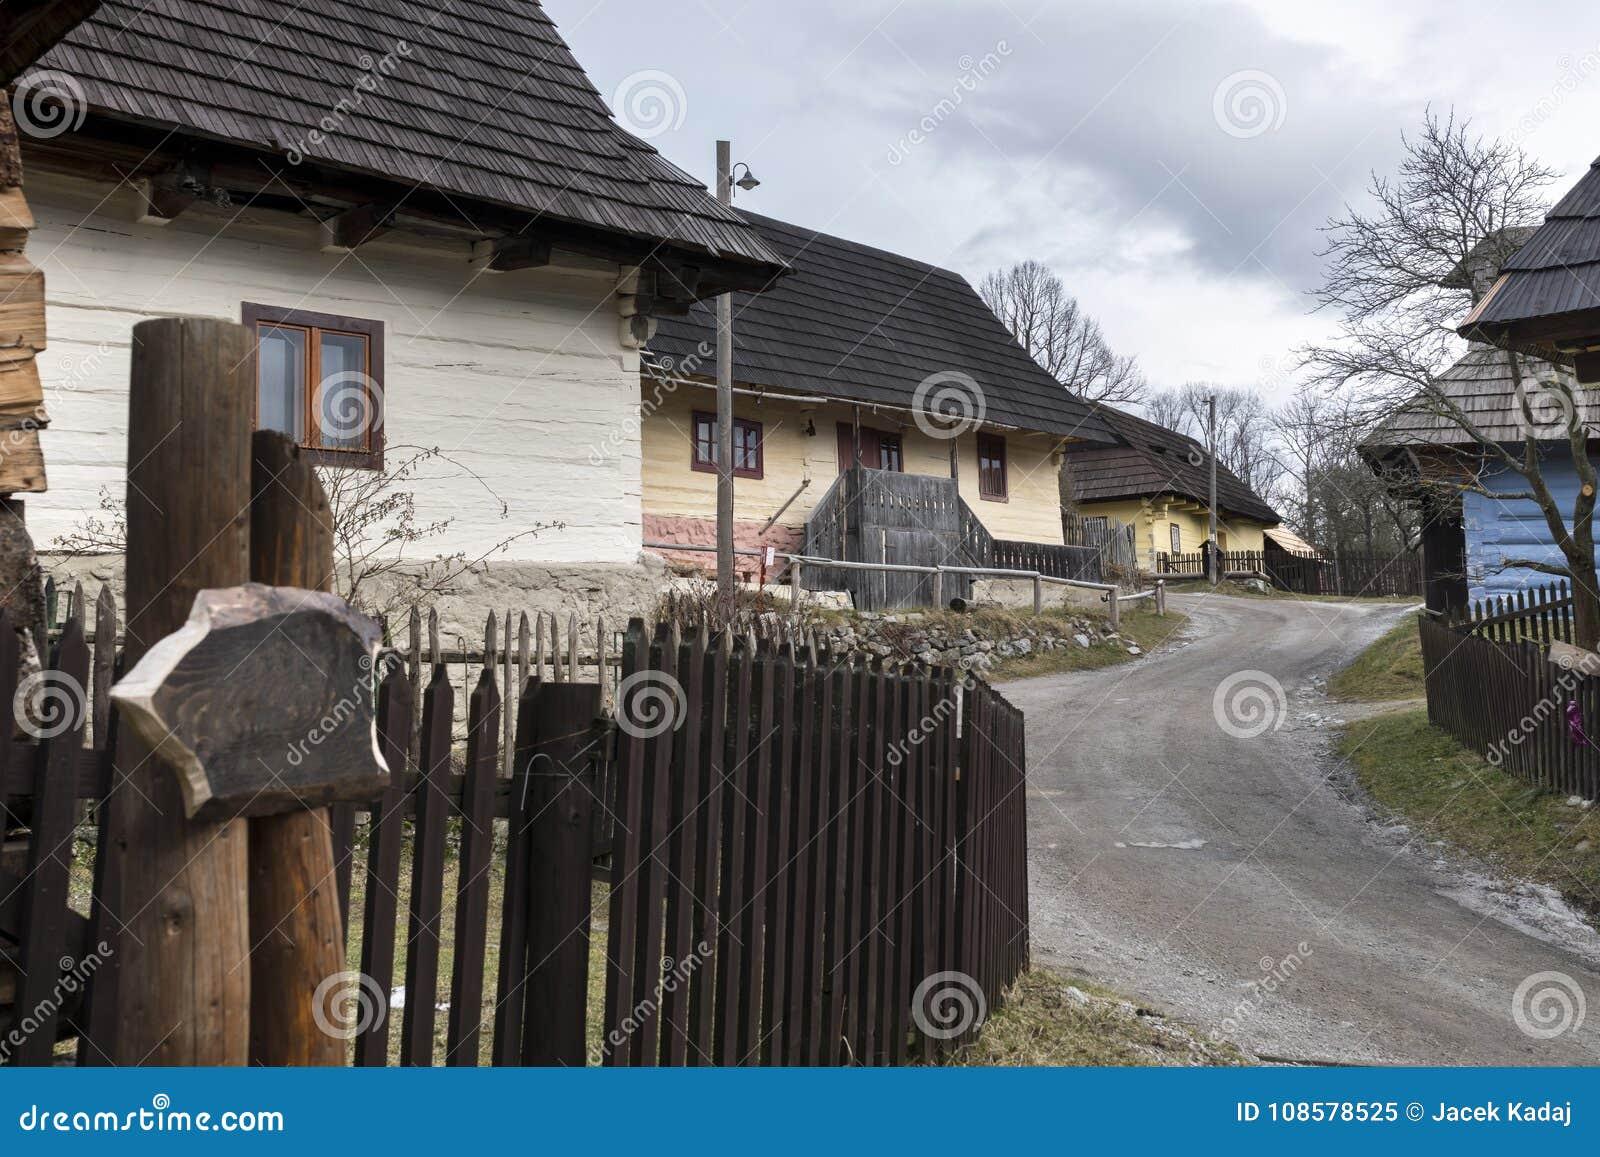 Wooden houses in Vlkolinec village, Slovak republic